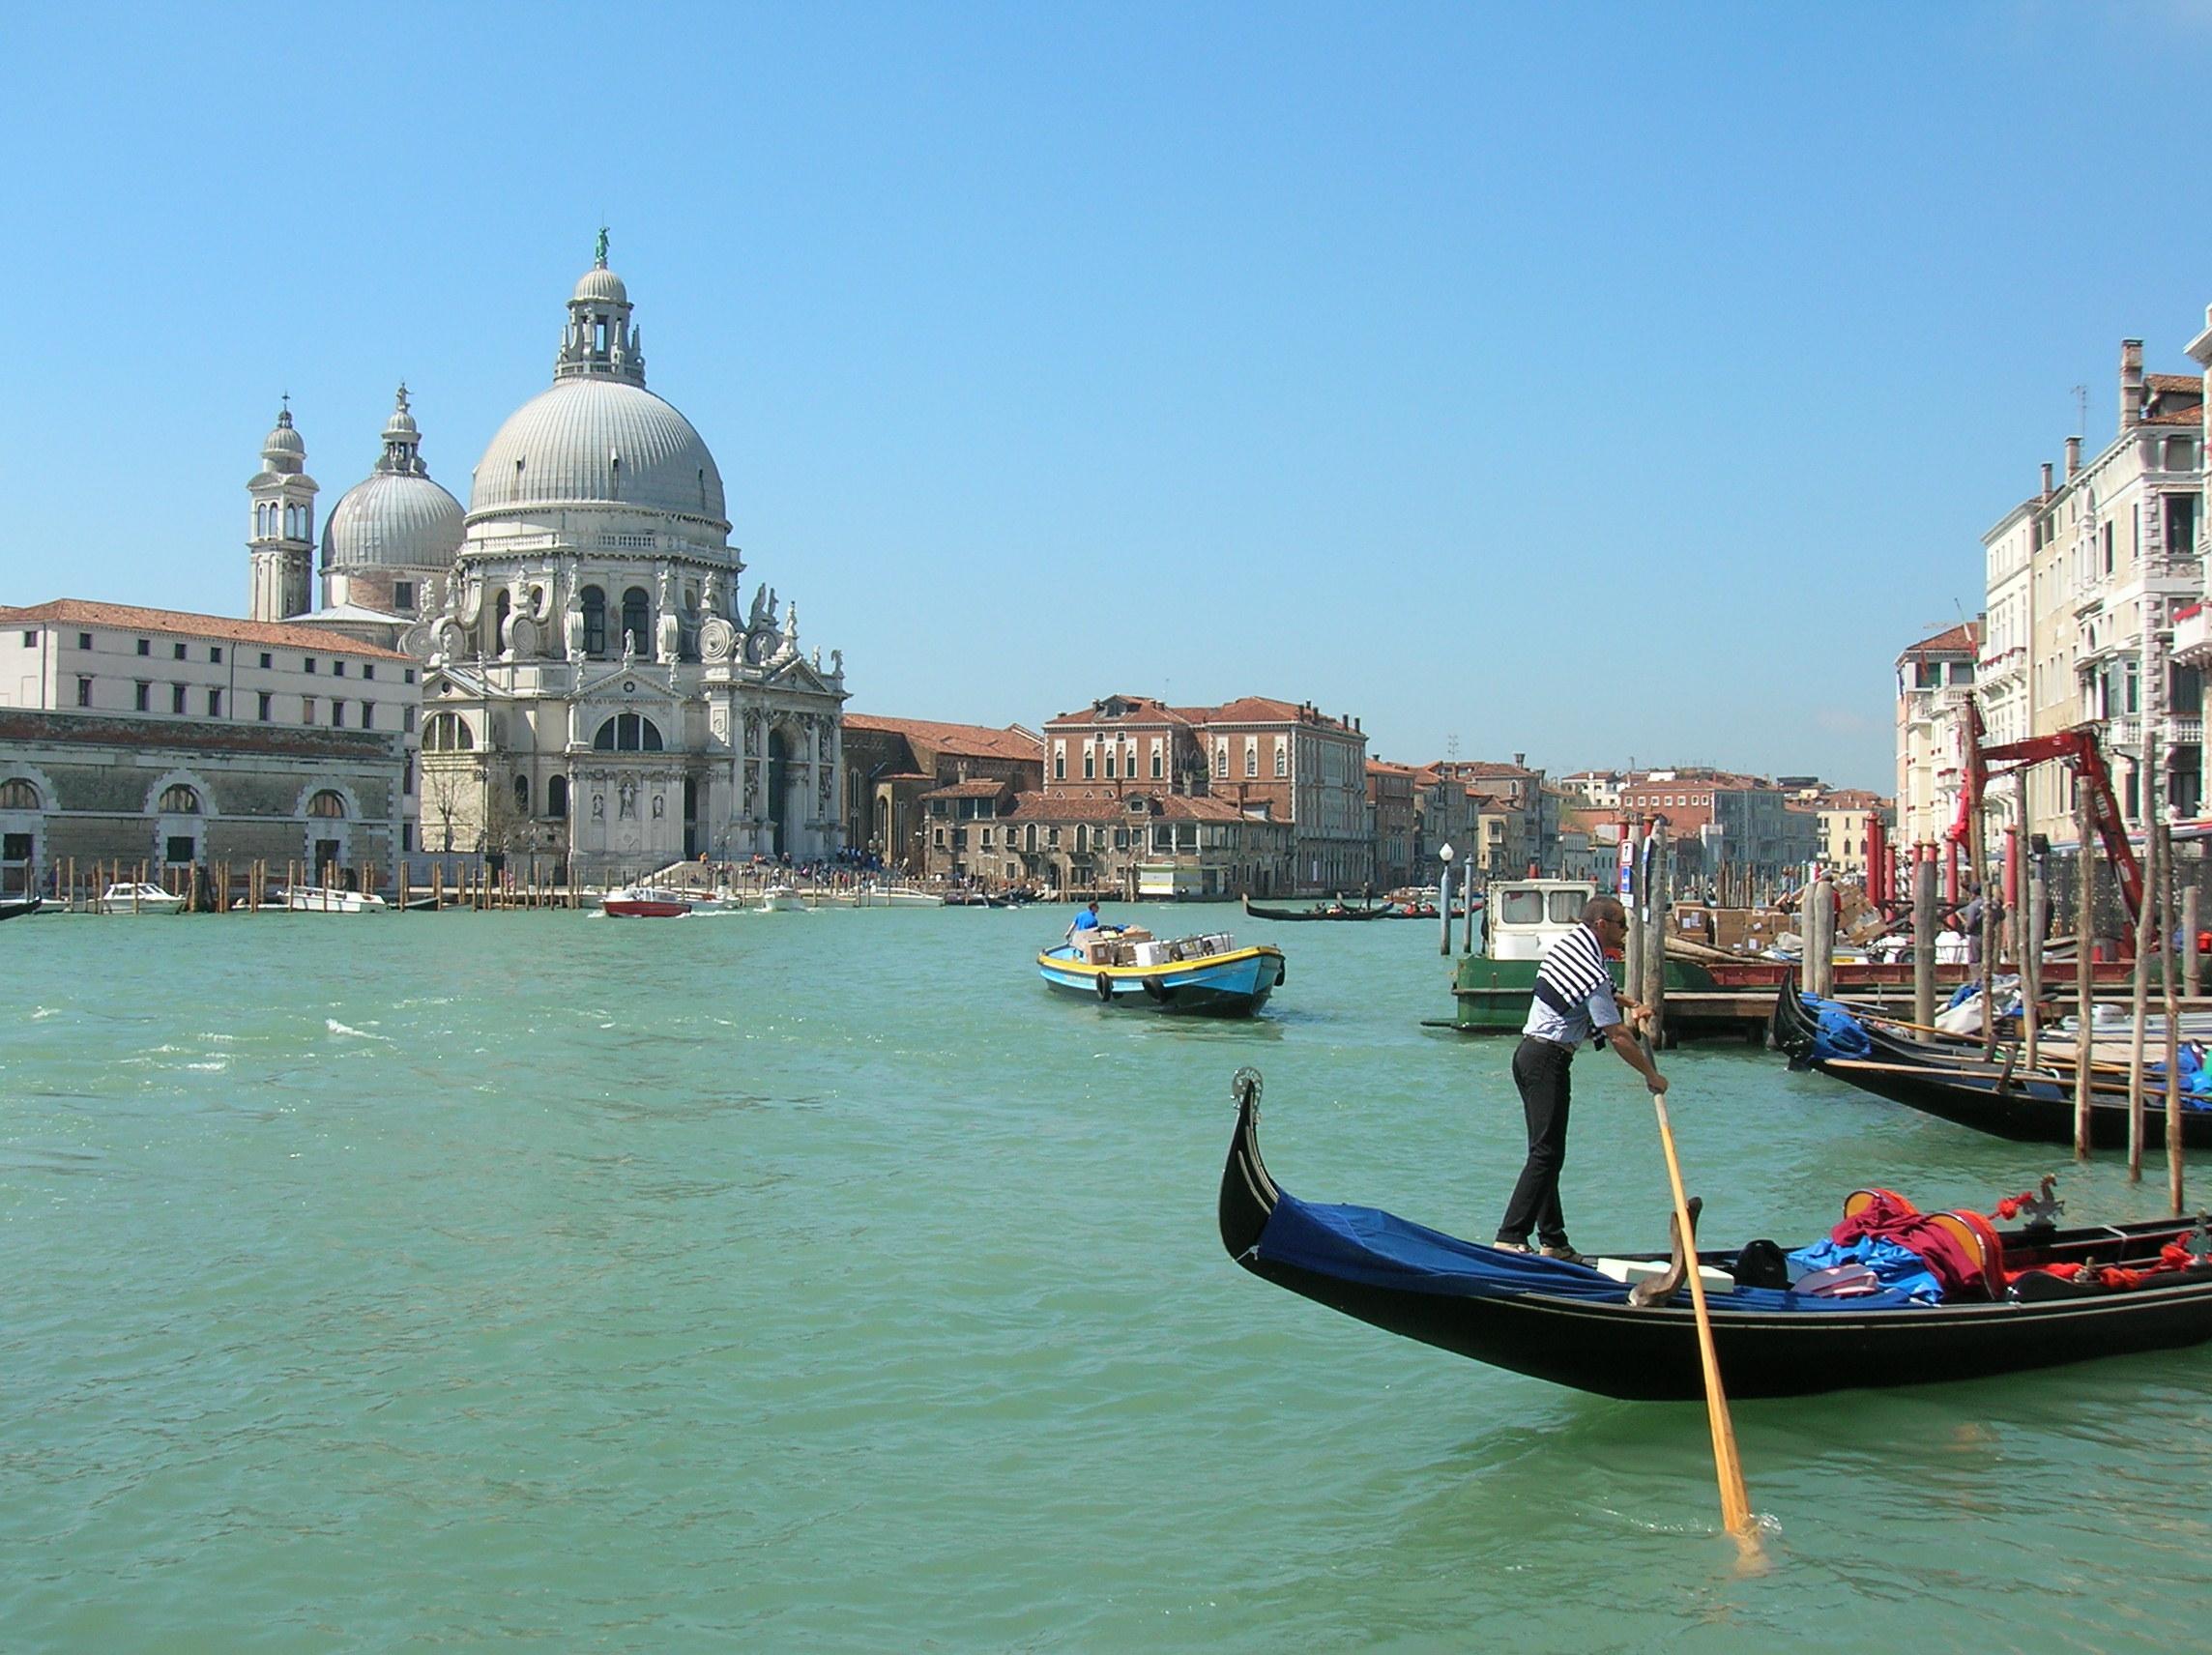 Venezia | Pearltrees - photo #48